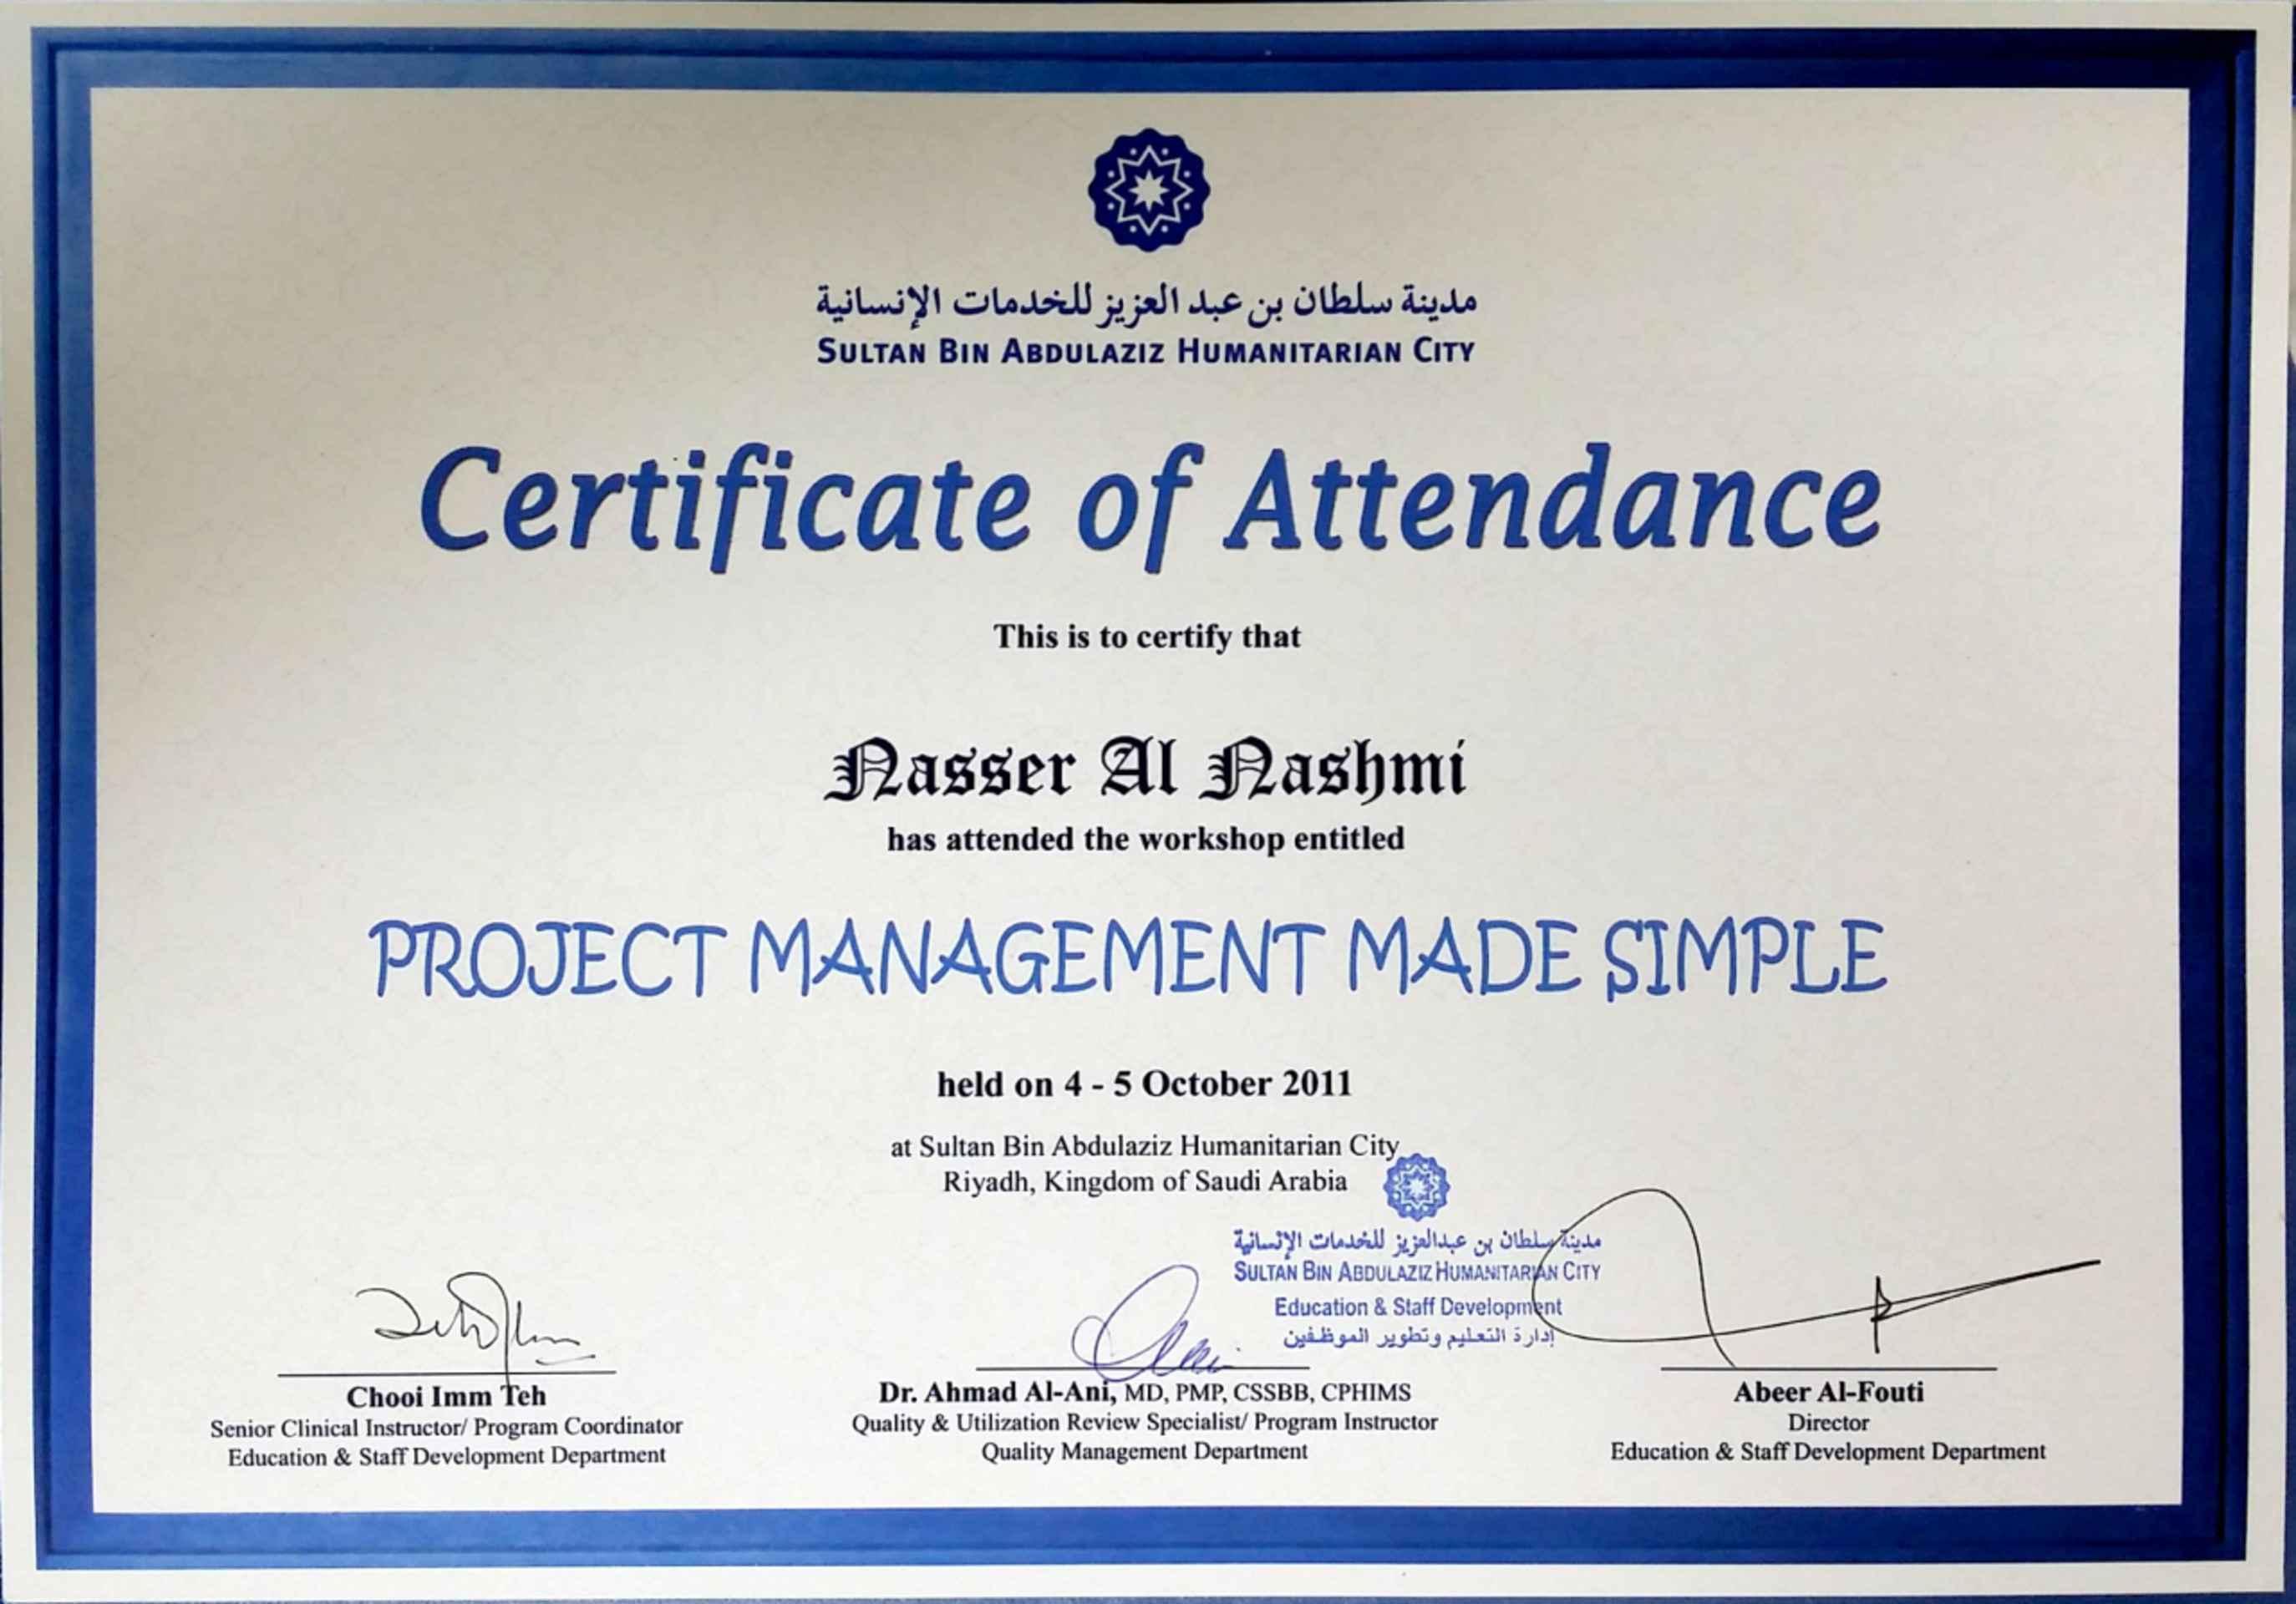 Nasser al nashmi bayt project management certificate 1betcityfo Gallery